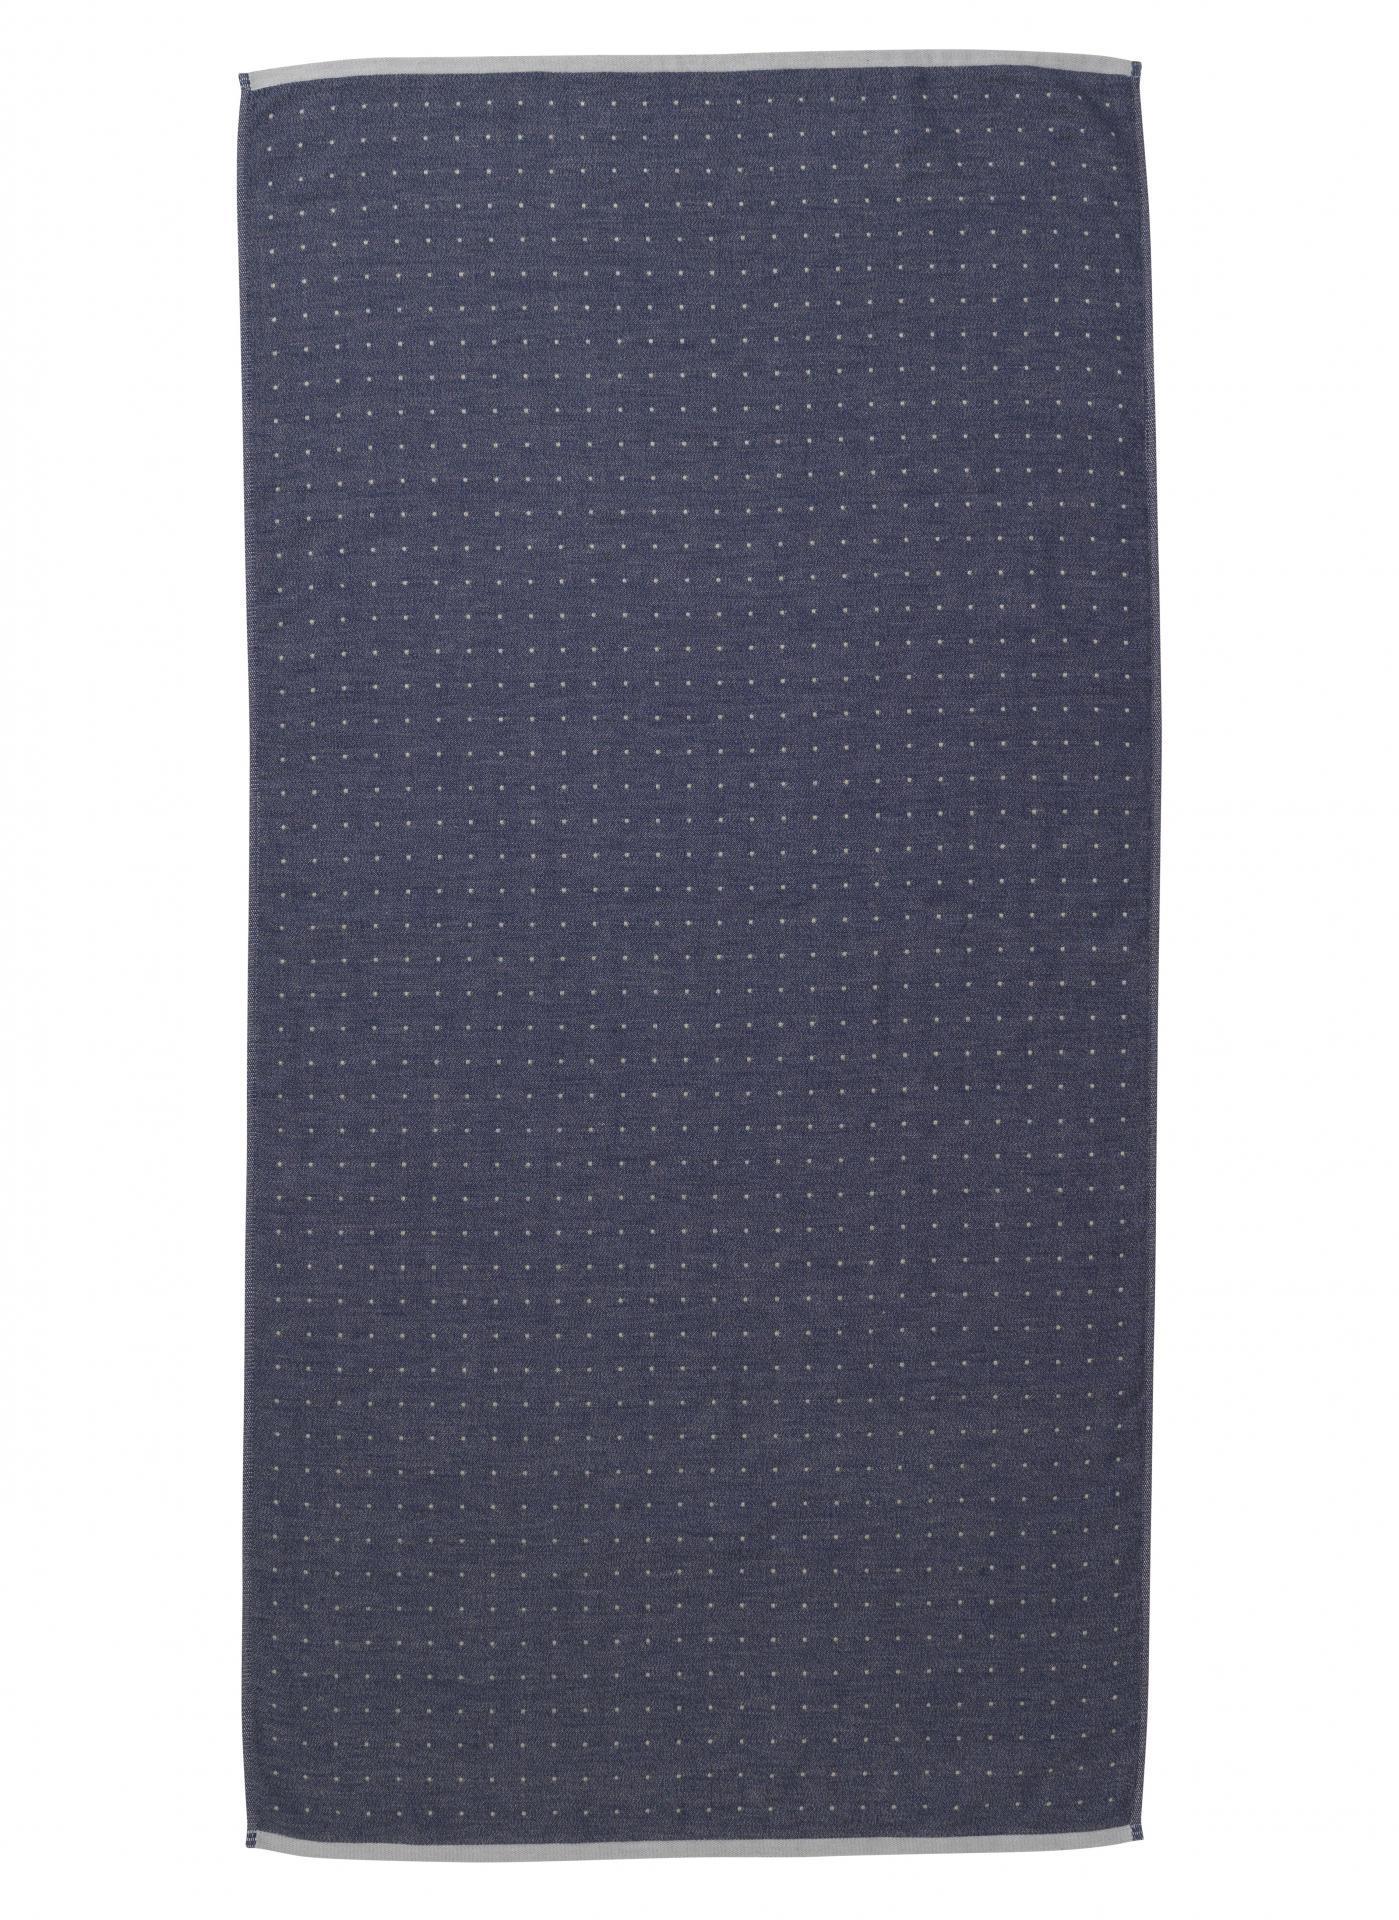 ferm LIVING Osuška Sento Blue 70x140 cm, modrá barva, textil